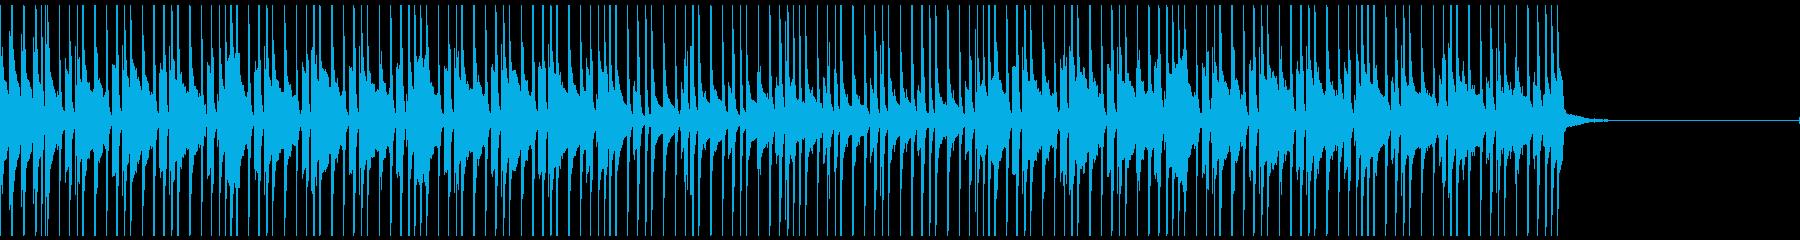 R&B レトロ ポジティブ 明るい...の再生済みの波形